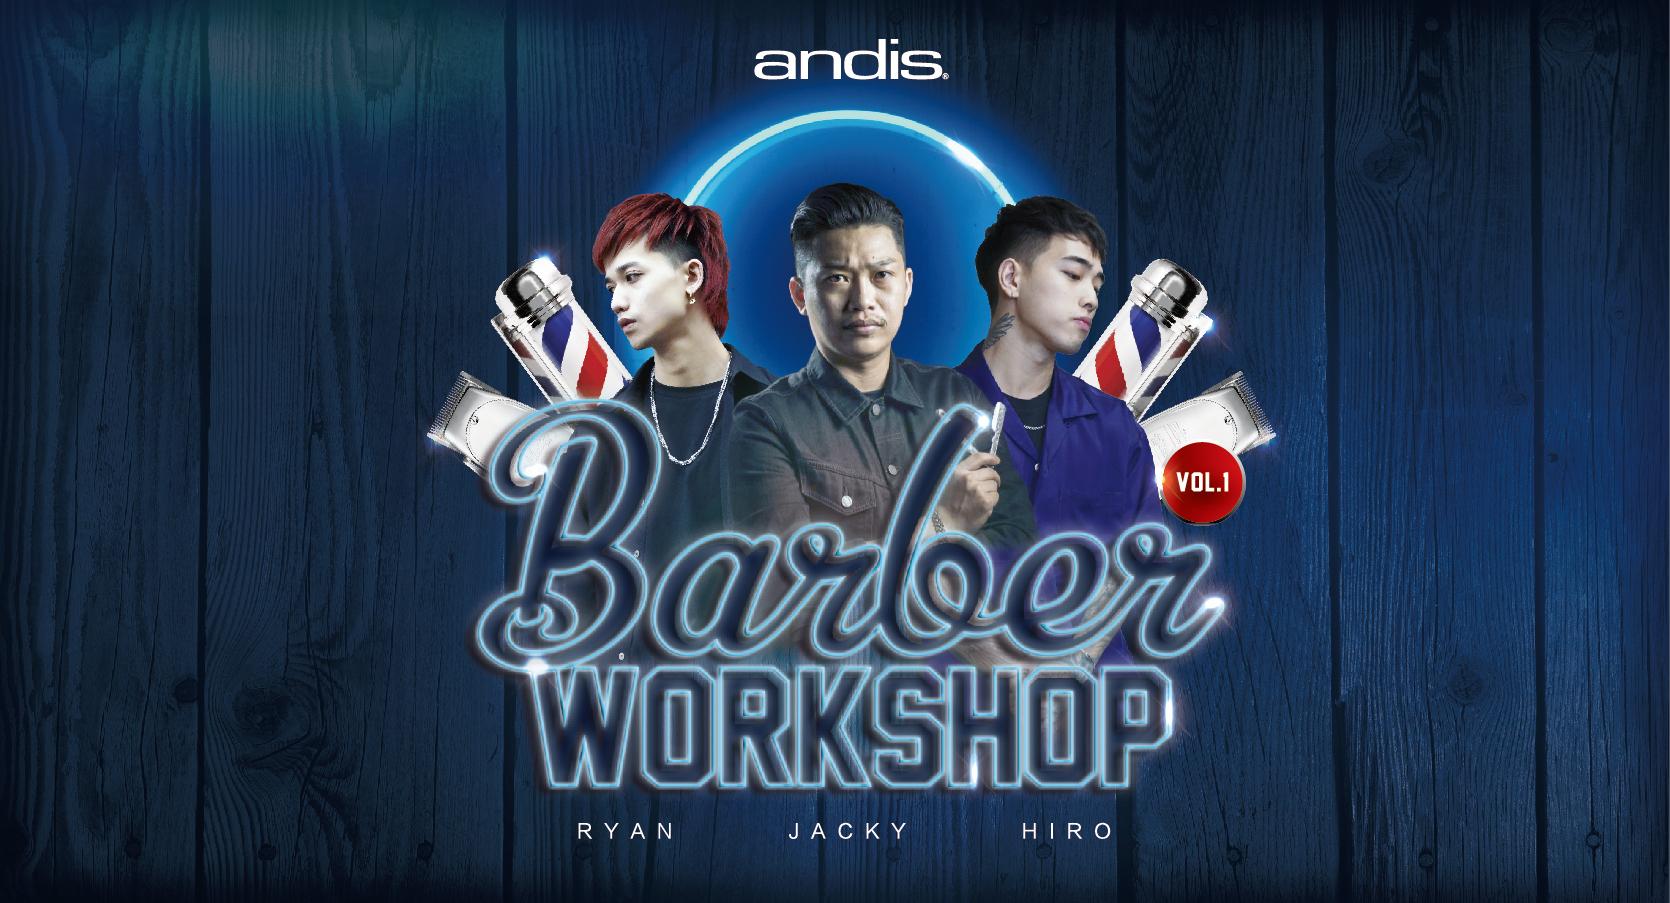 ANDIS 精緻男士理髮技術研討會, Barber workshop Vol.1